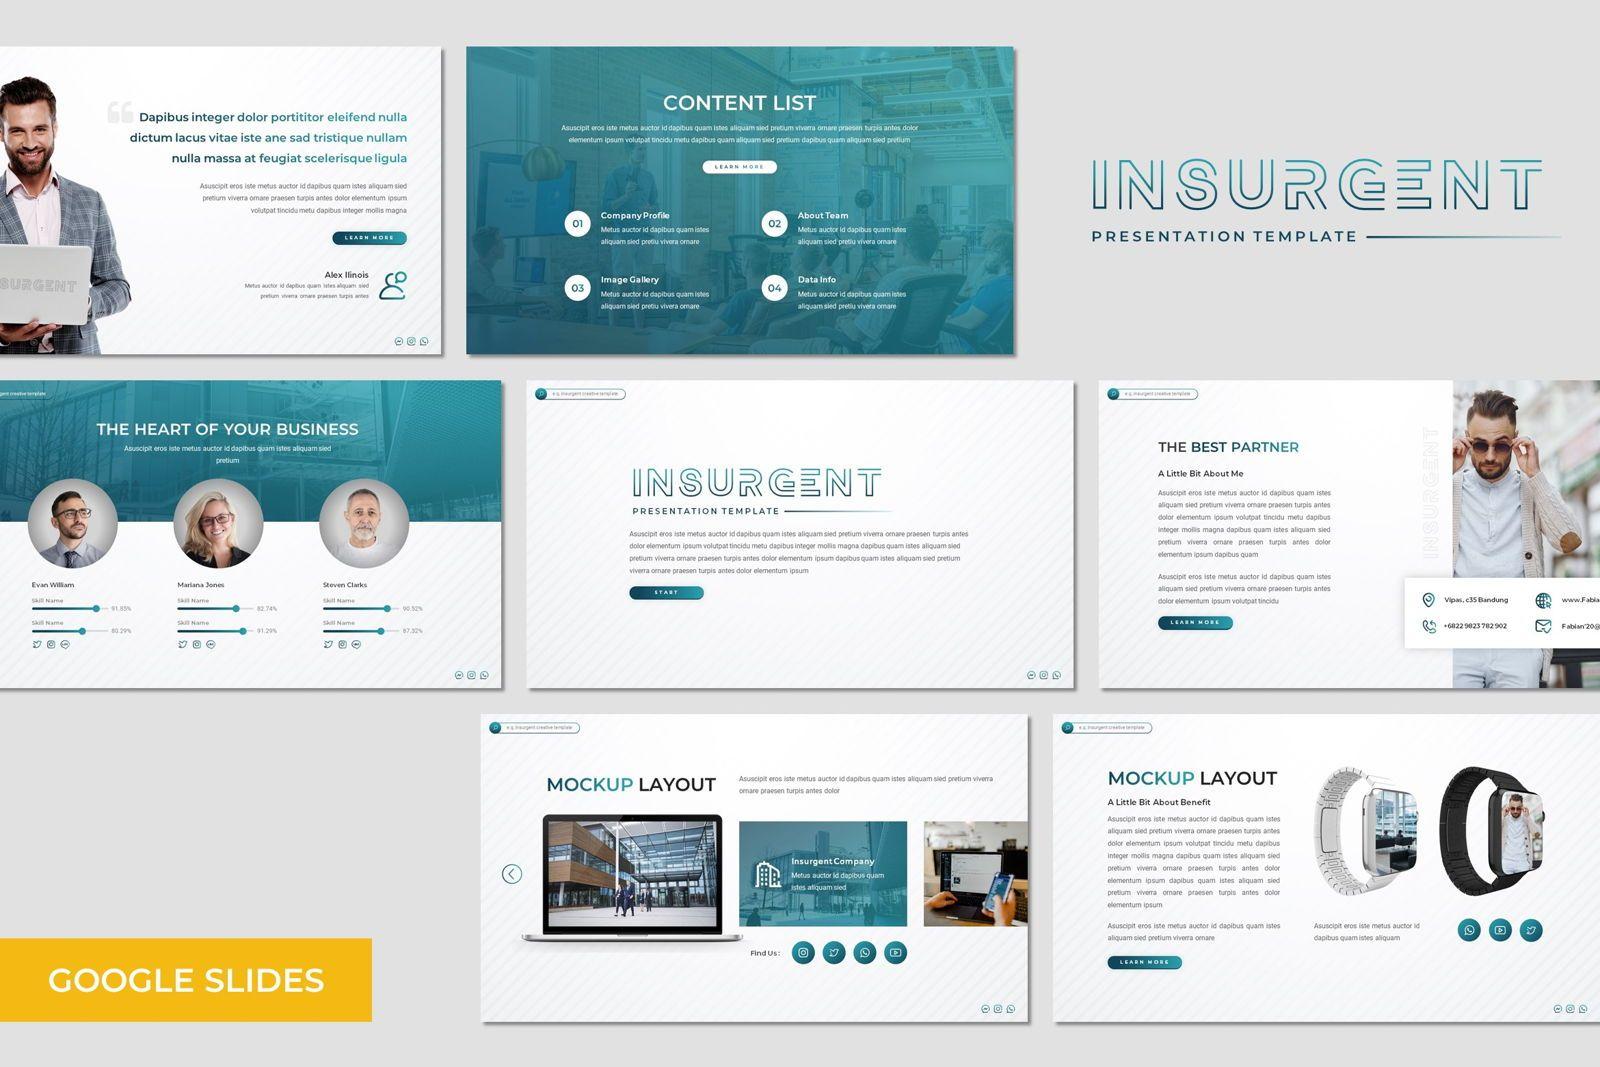 Insurgent - Google Slides Template, 07824, Presentation Templates — PoweredTemplate.com